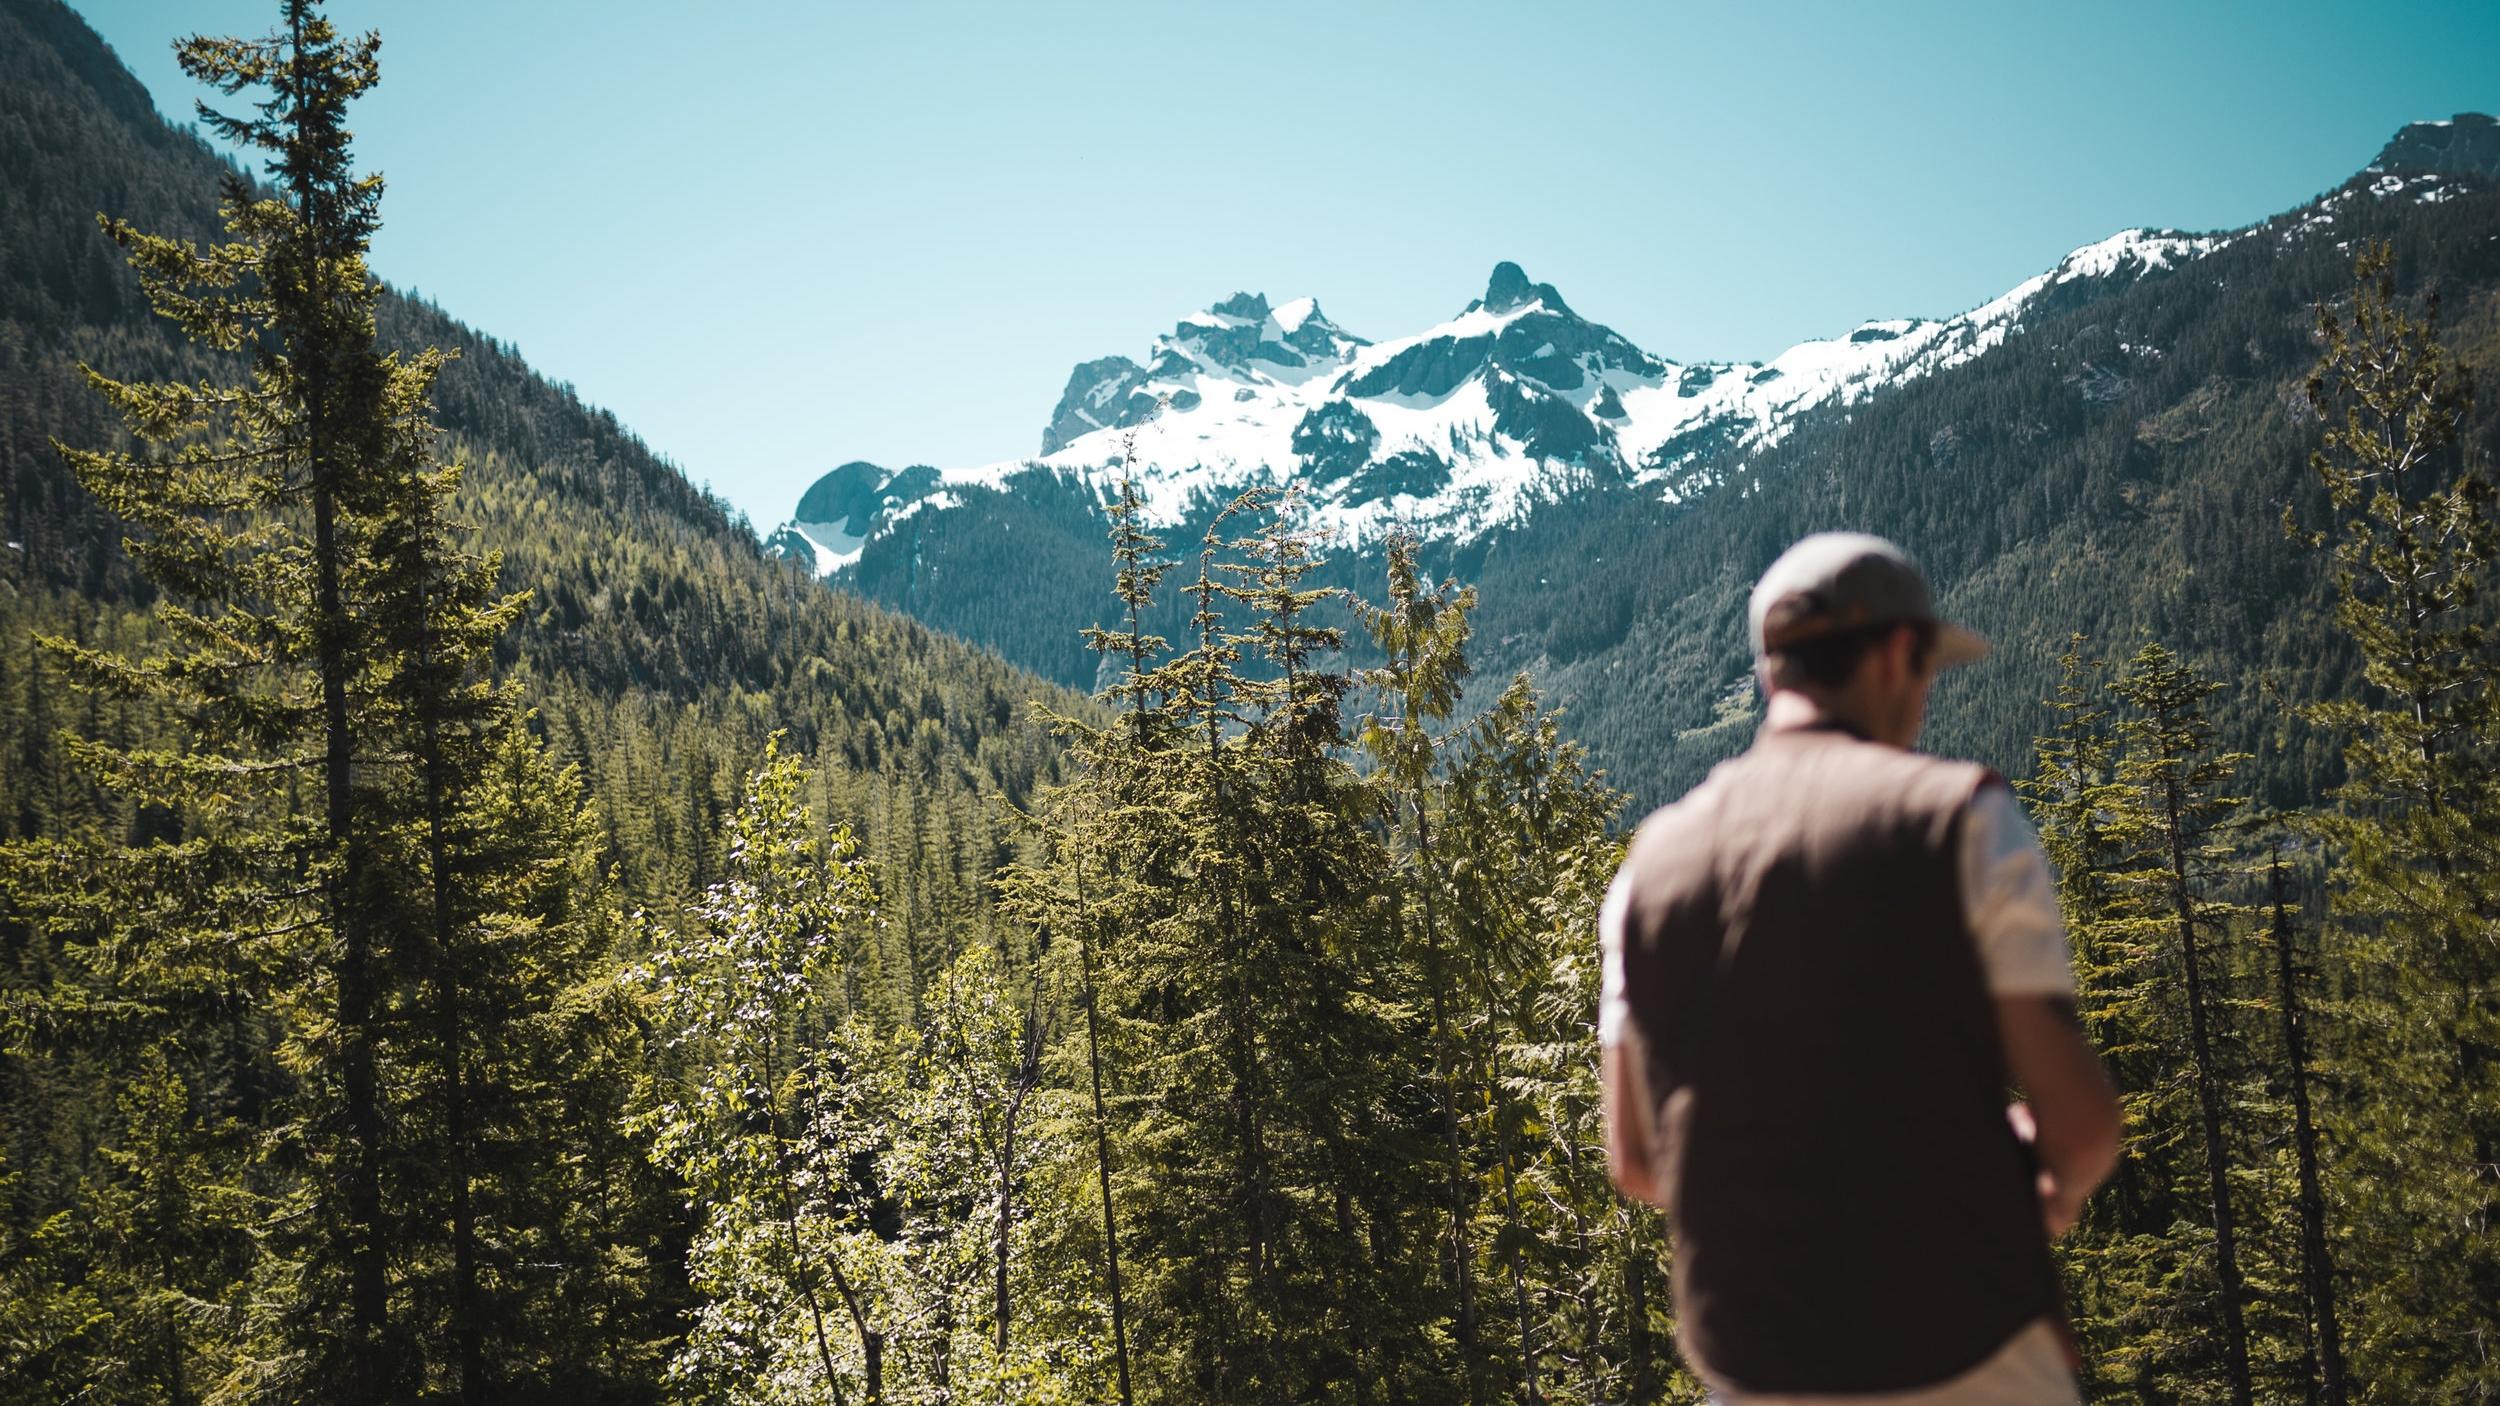 PNW - Vancouver // Washington // Oregon